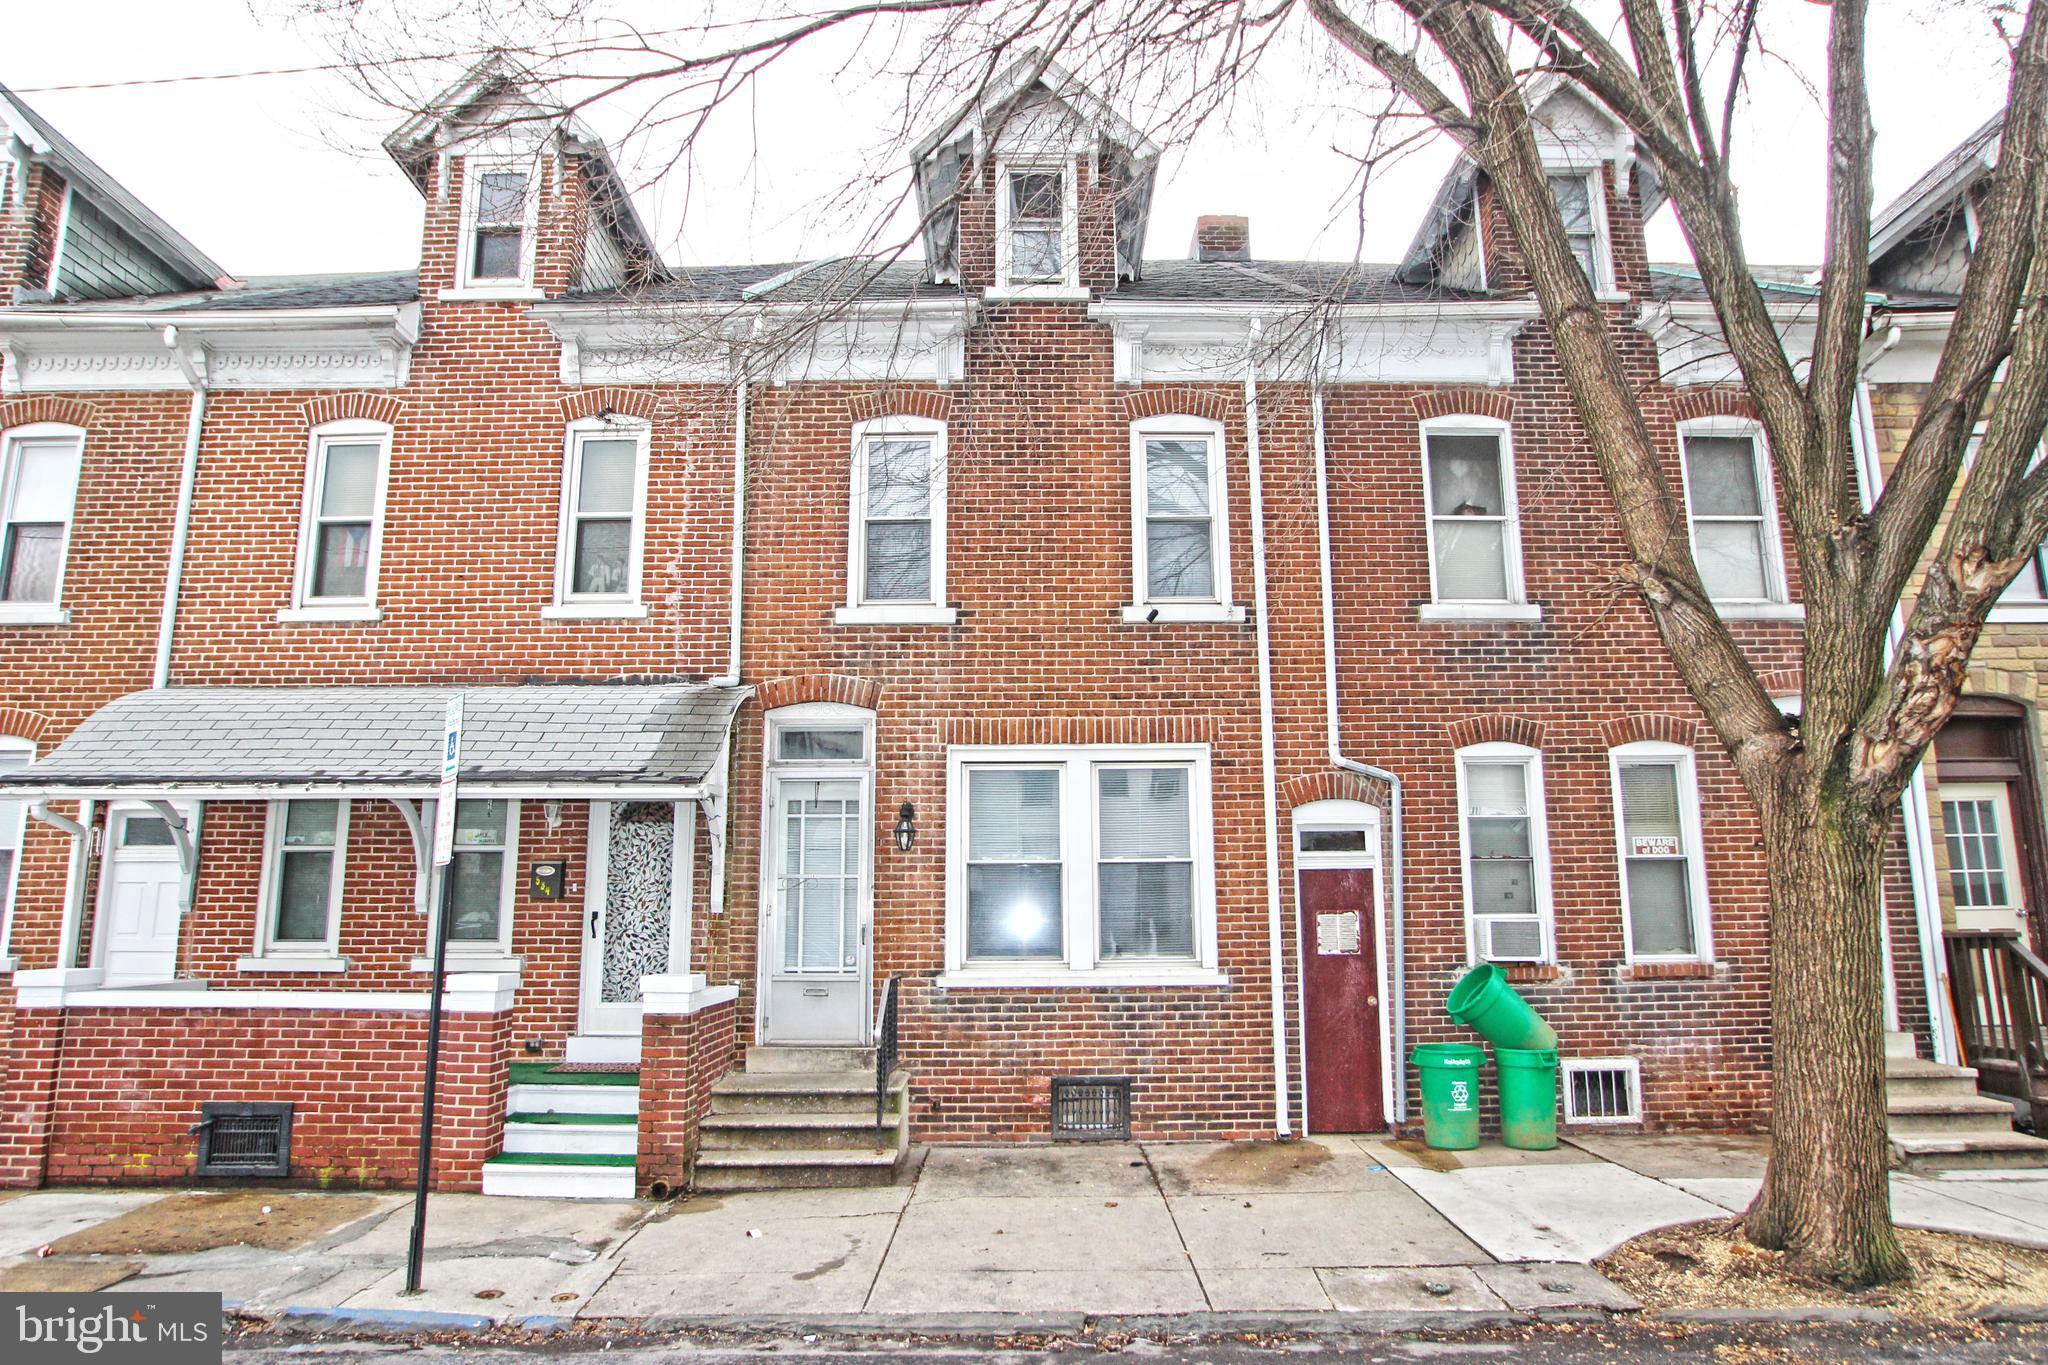 536 N 10TH STREET, ALLENTOWN, PA 18102